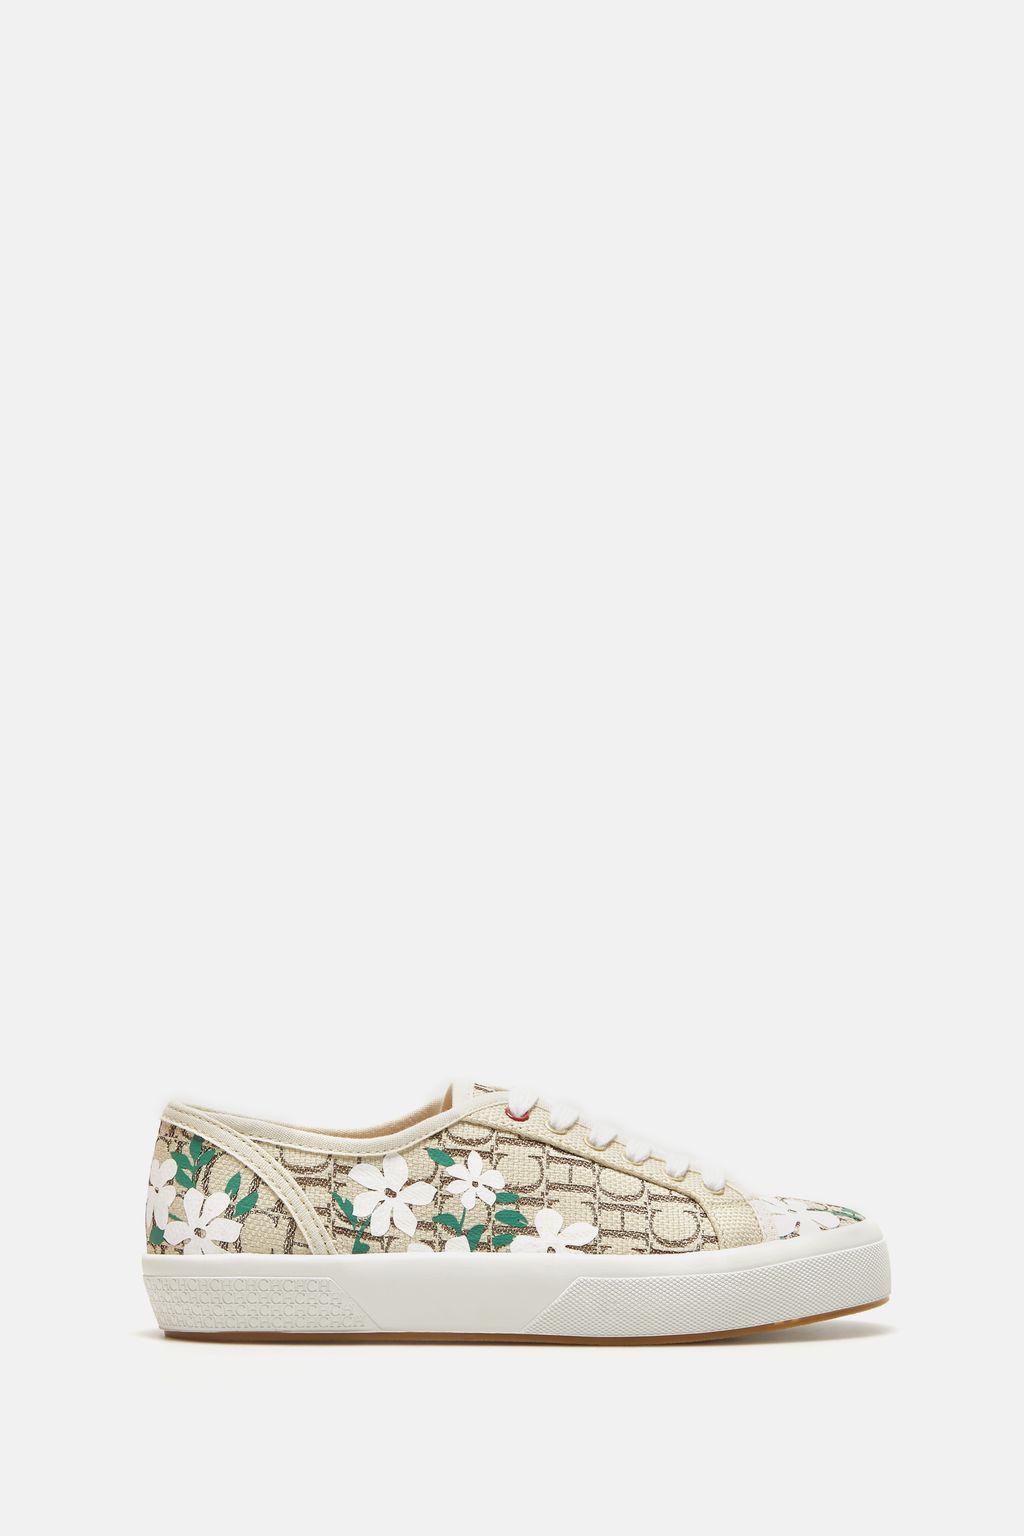 Jasmine Caracas canvas Bamba sneakers